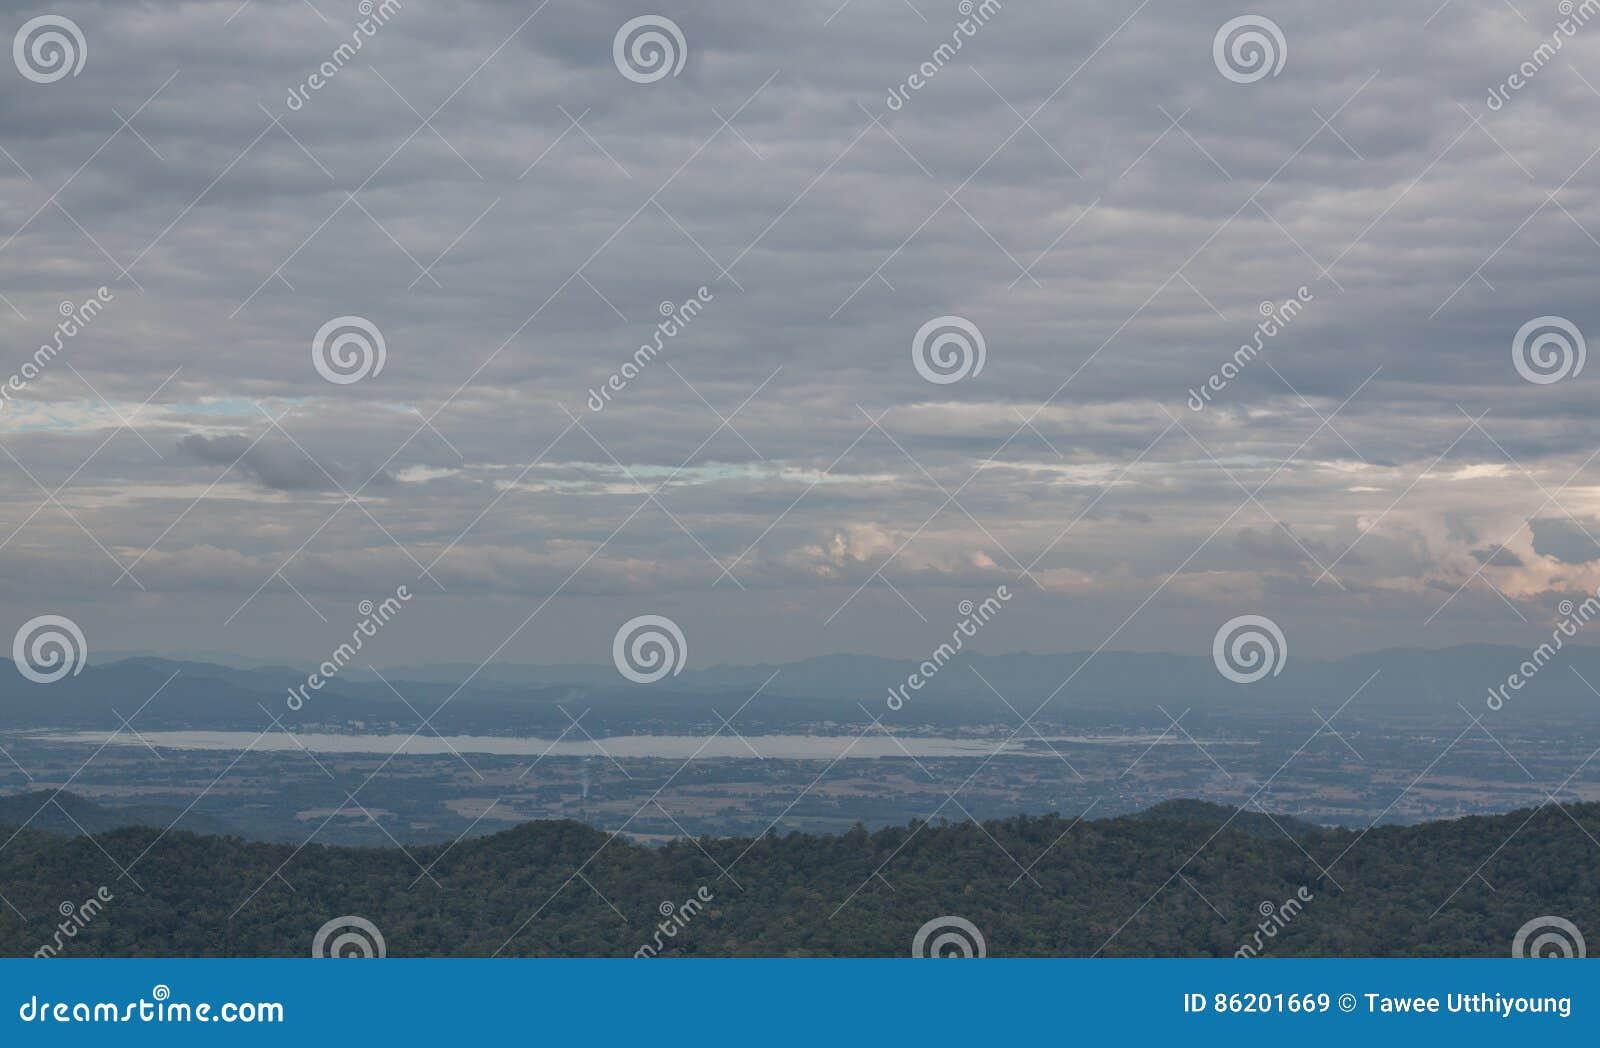 Strom molnhimmel